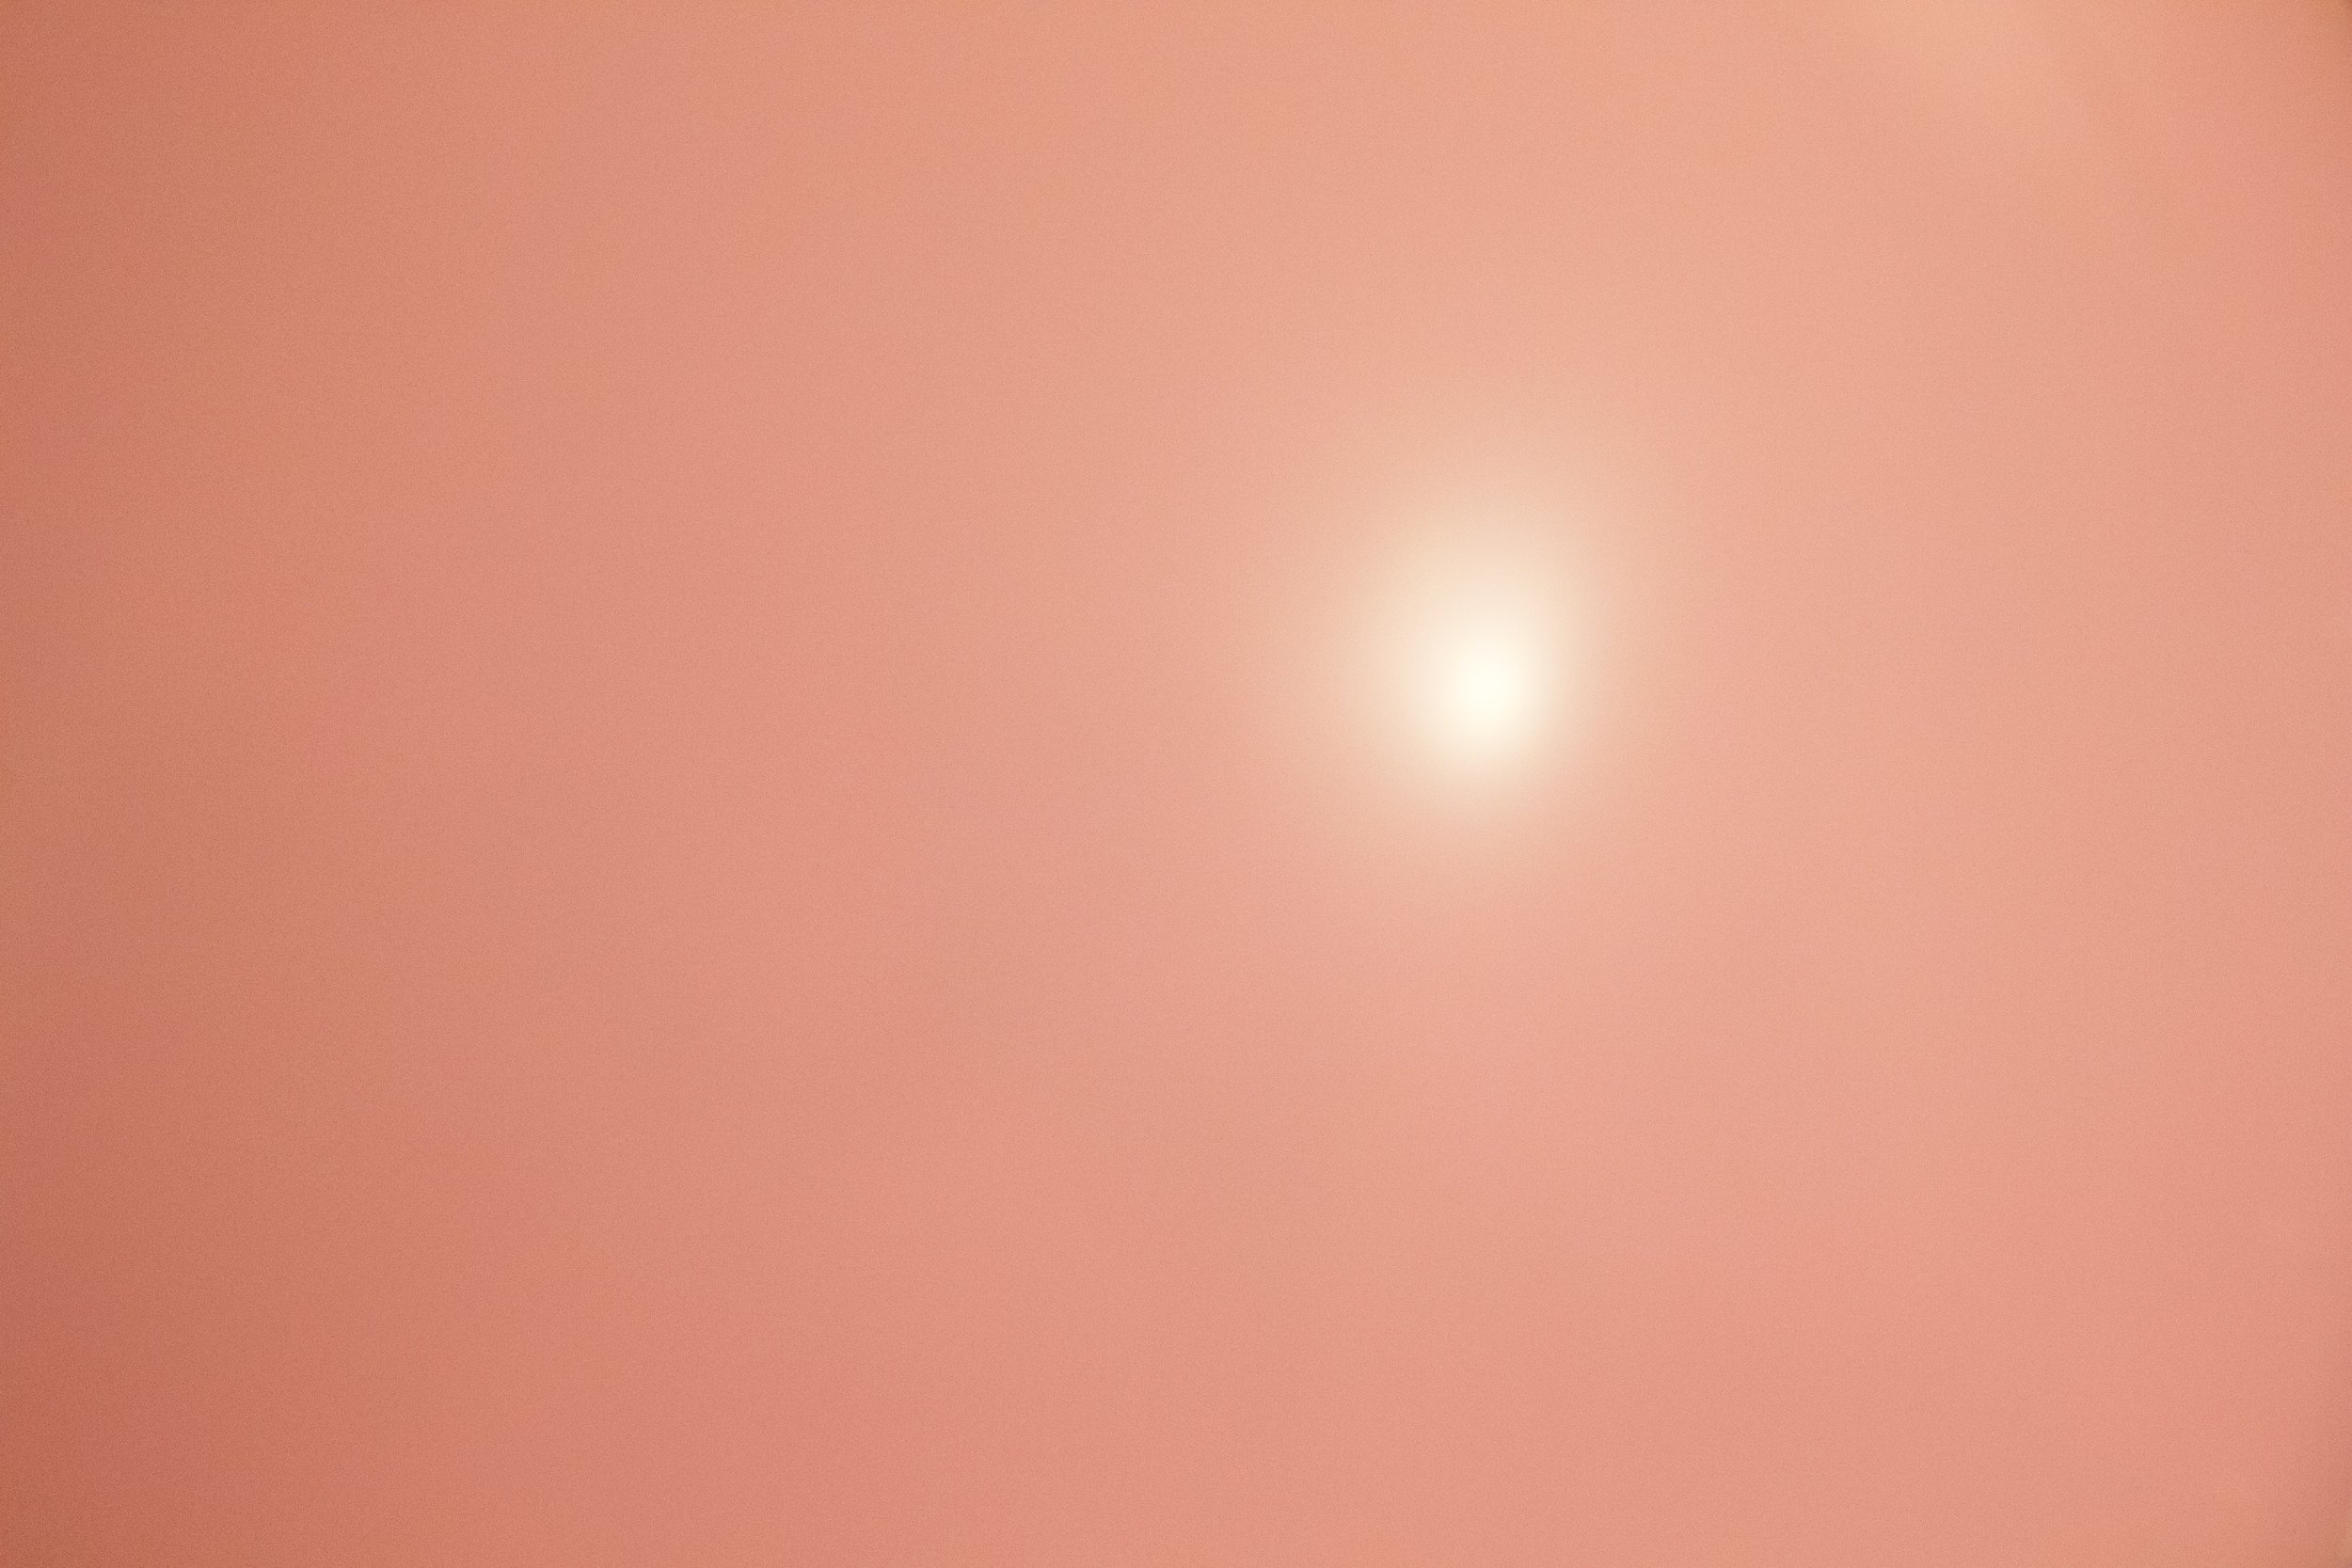 bright-desktop-backgrounds-filter-880639.jpg